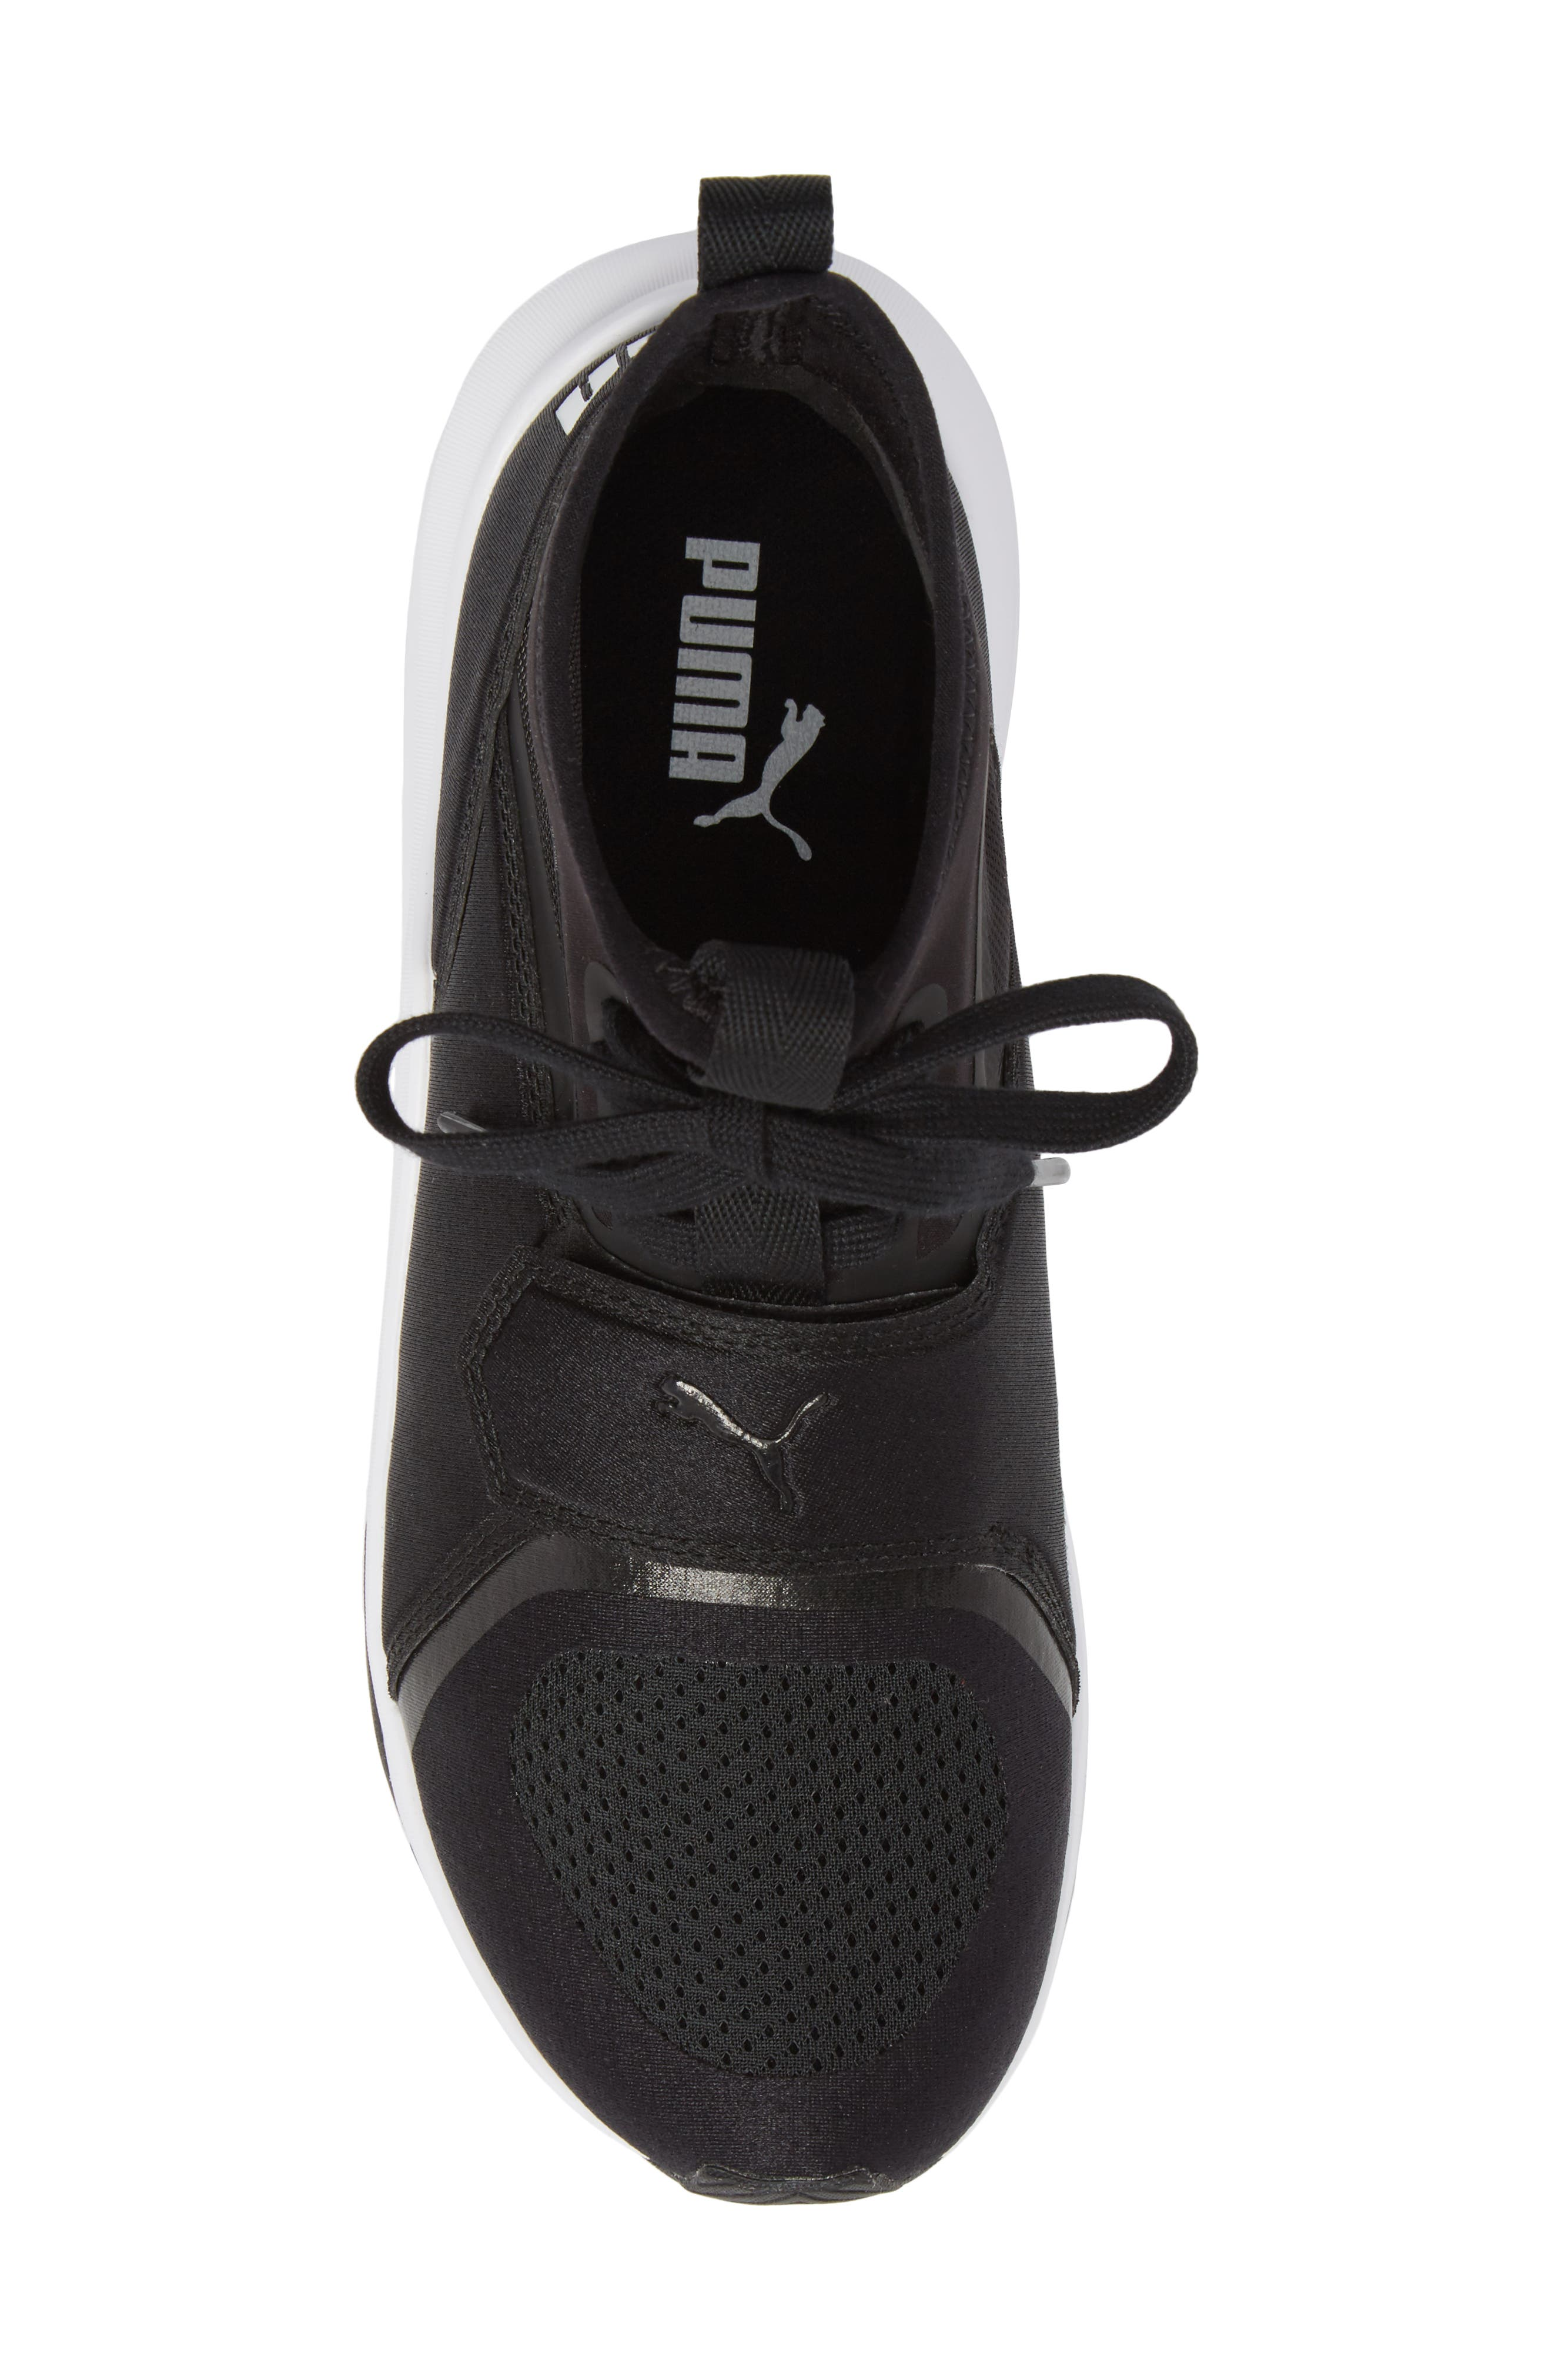 Phenom Jr High Top Sneaker,                             Alternate thumbnail 5, color,                             Puma Black/ Puma White